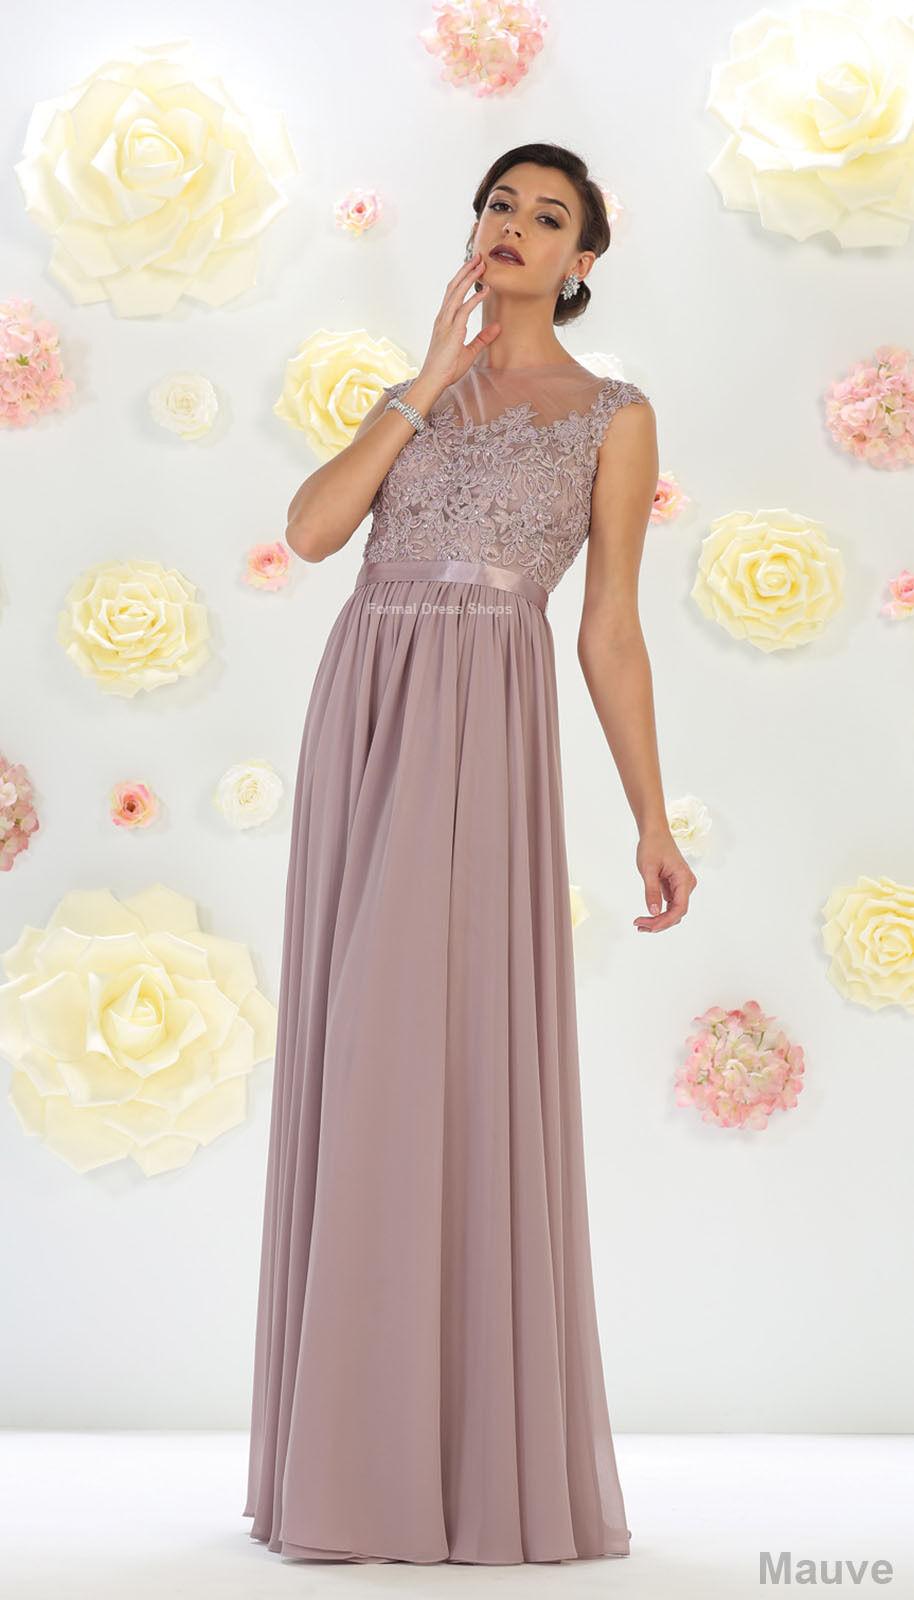 Modern Formal Attire: NEW BRIDESMAIDS EVENING FORMAL PROM FLOWY DRESS MODERN